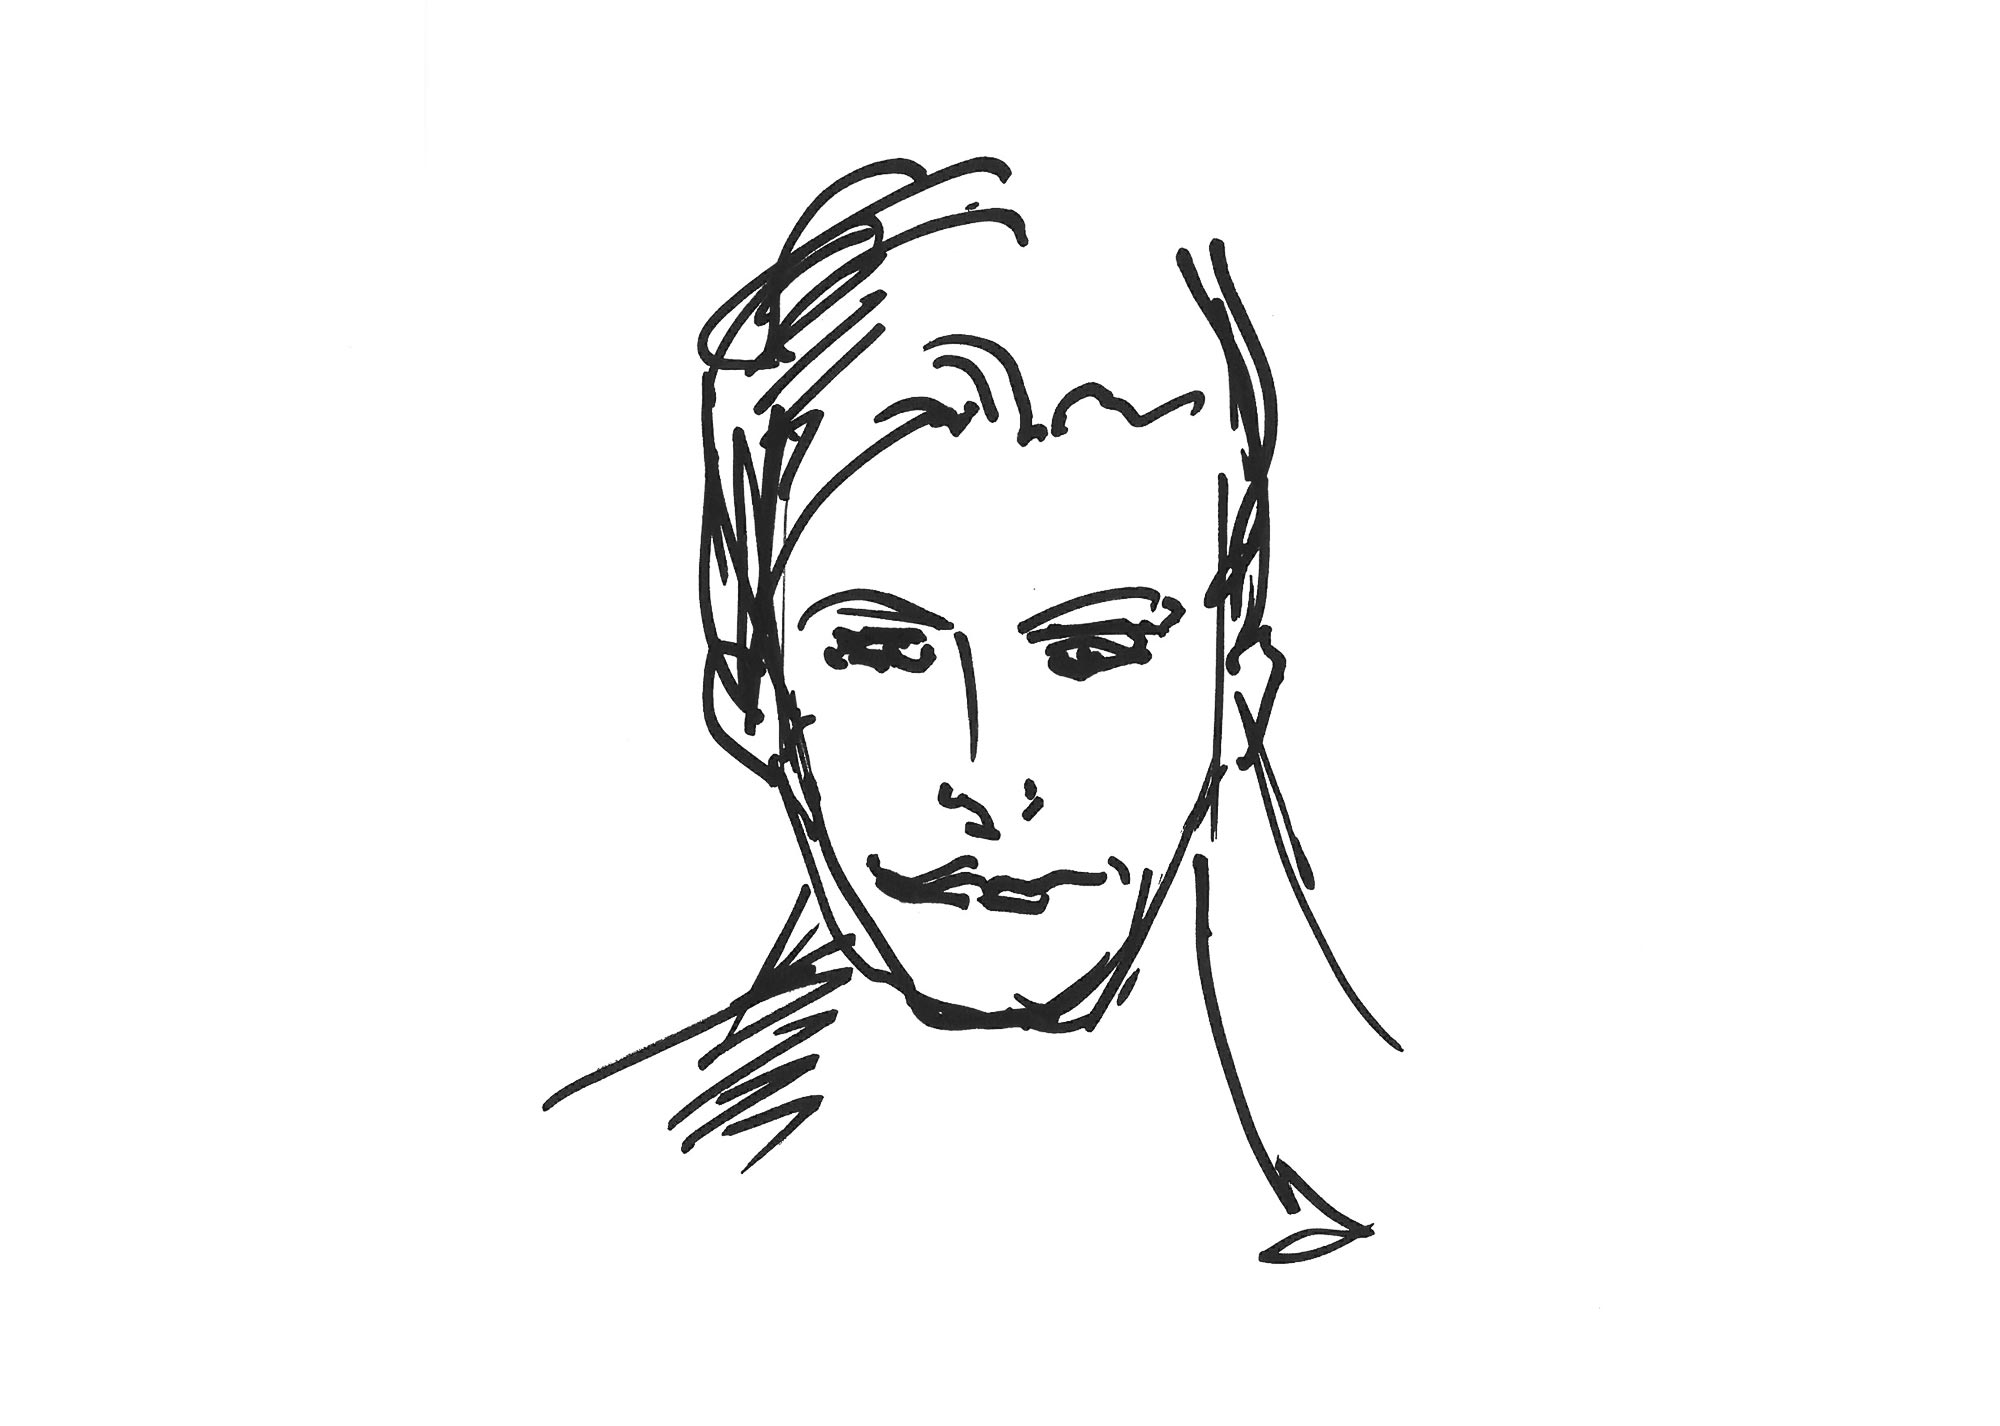 Skizze junger Mann, Marker